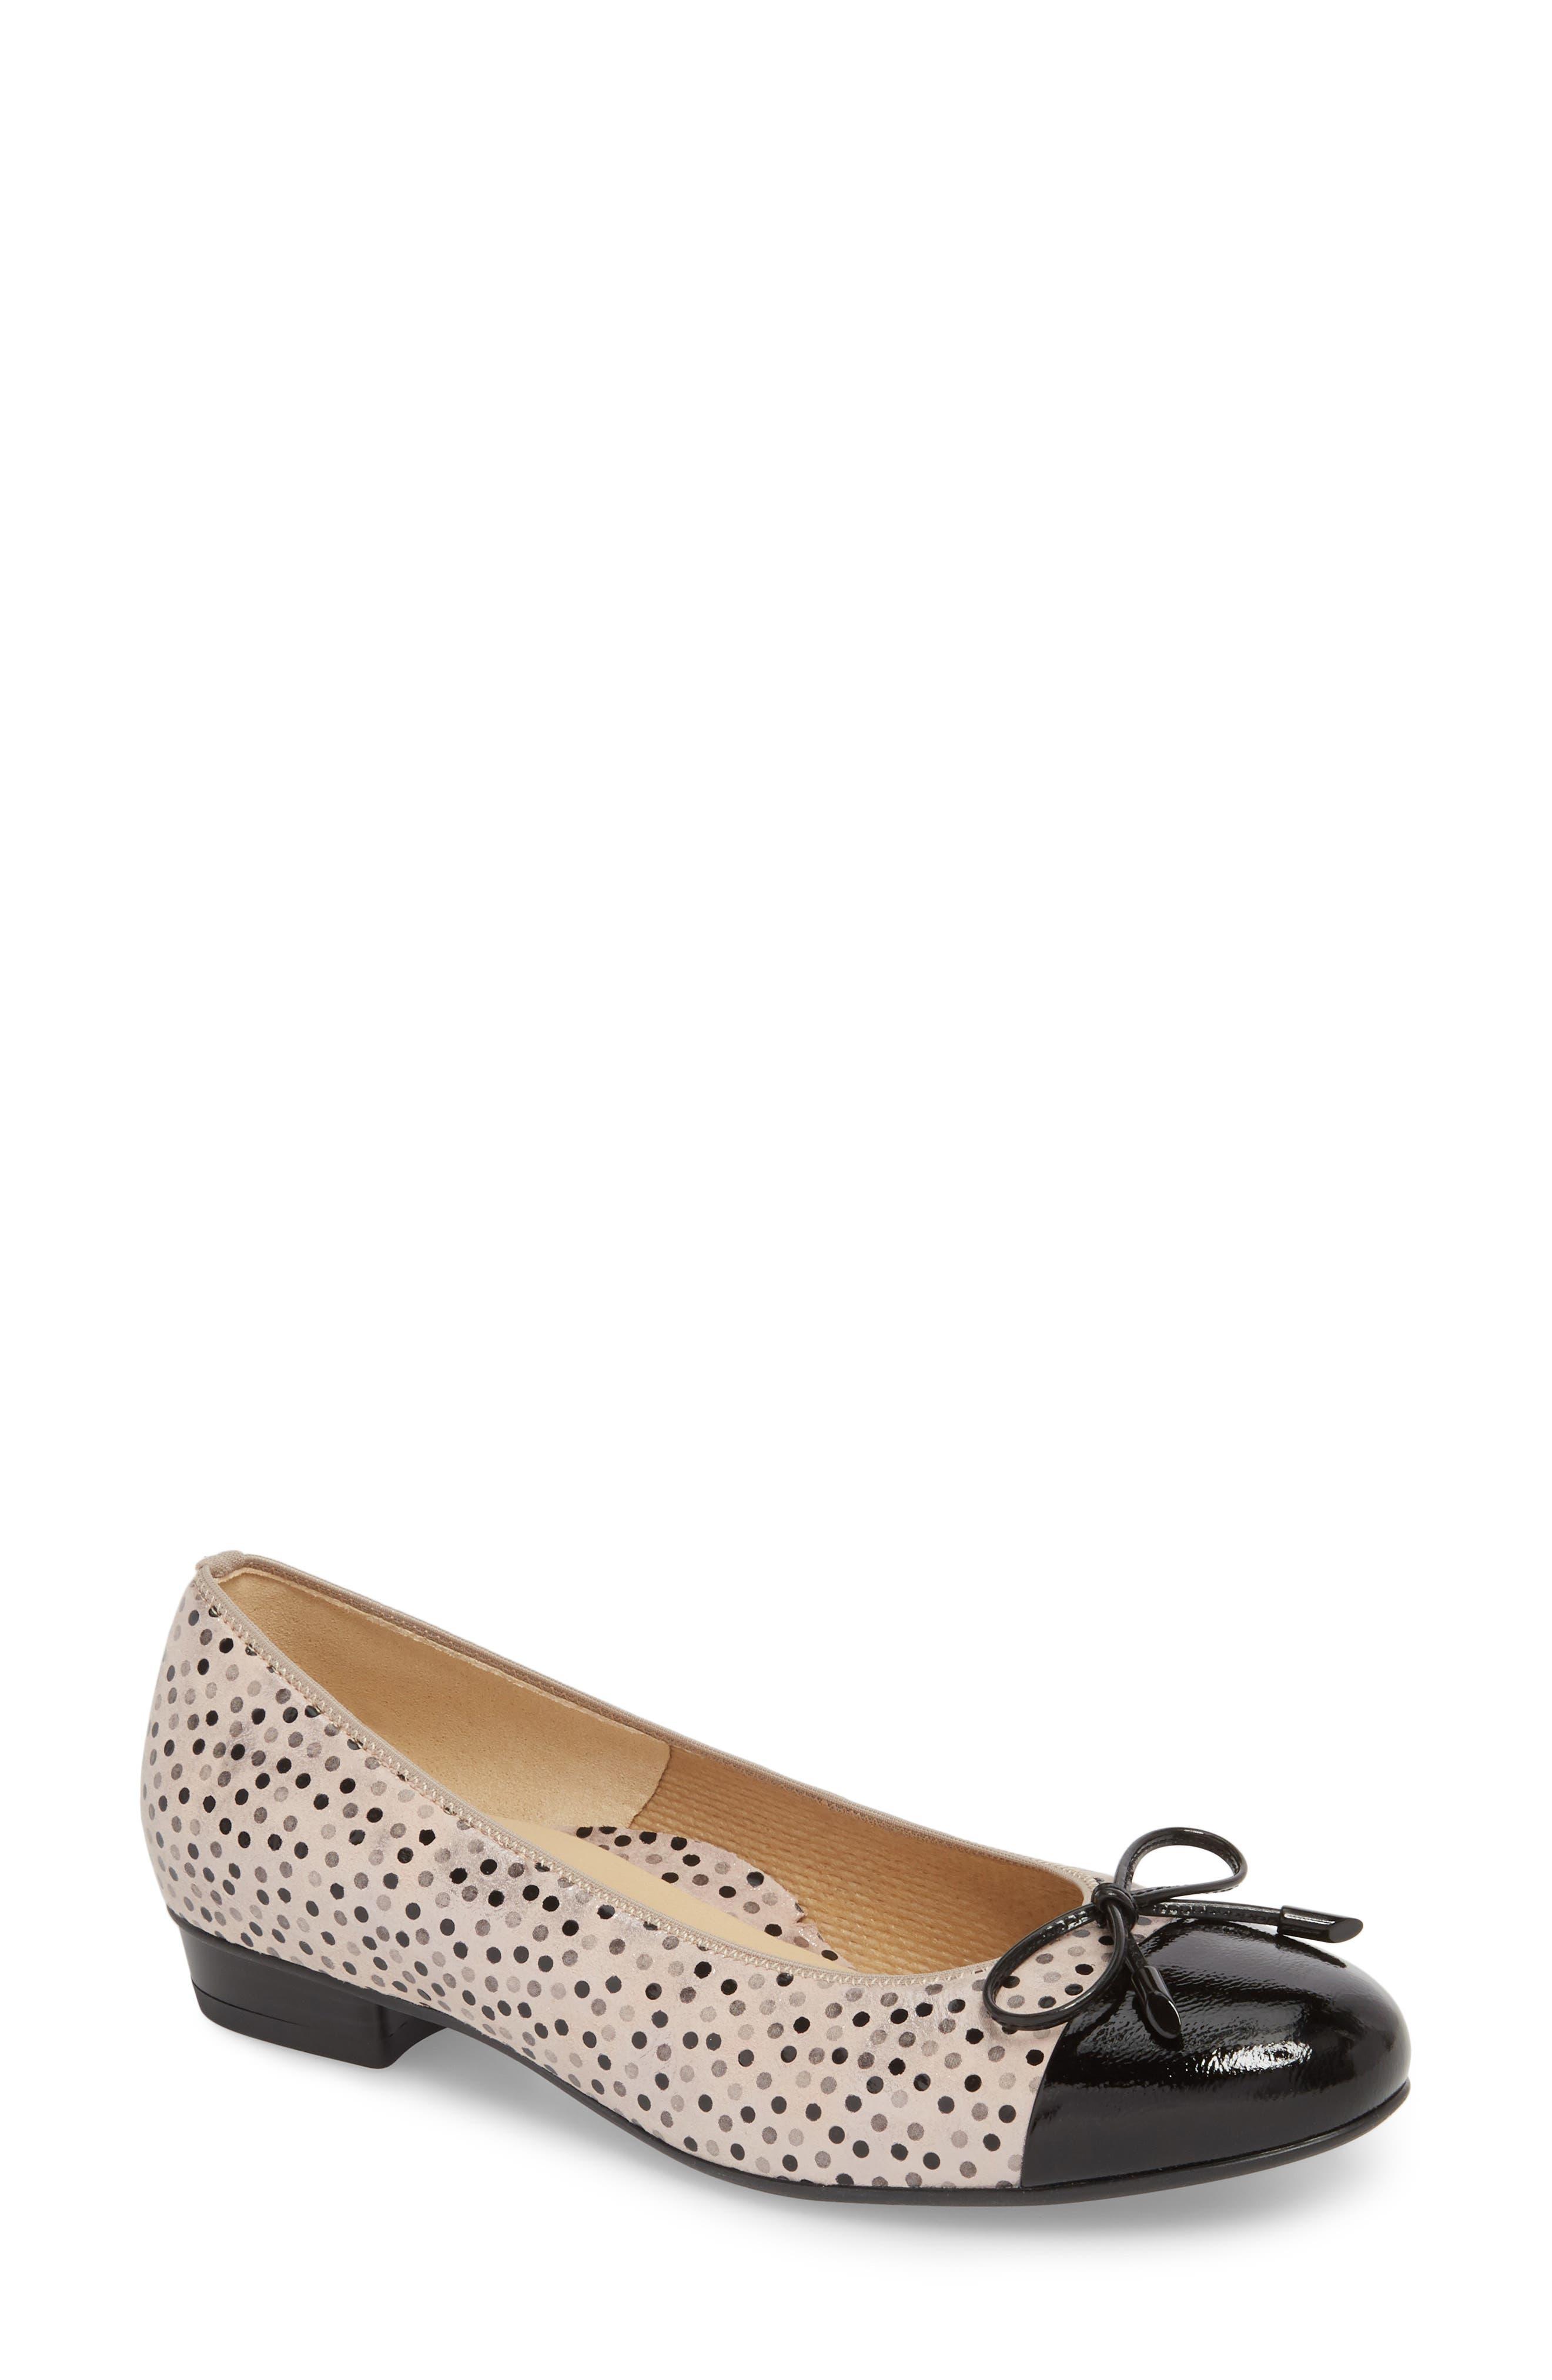 'Betty' Cap Toe Flat,                             Main thumbnail 1, color,                             Black Polka Dot Leather